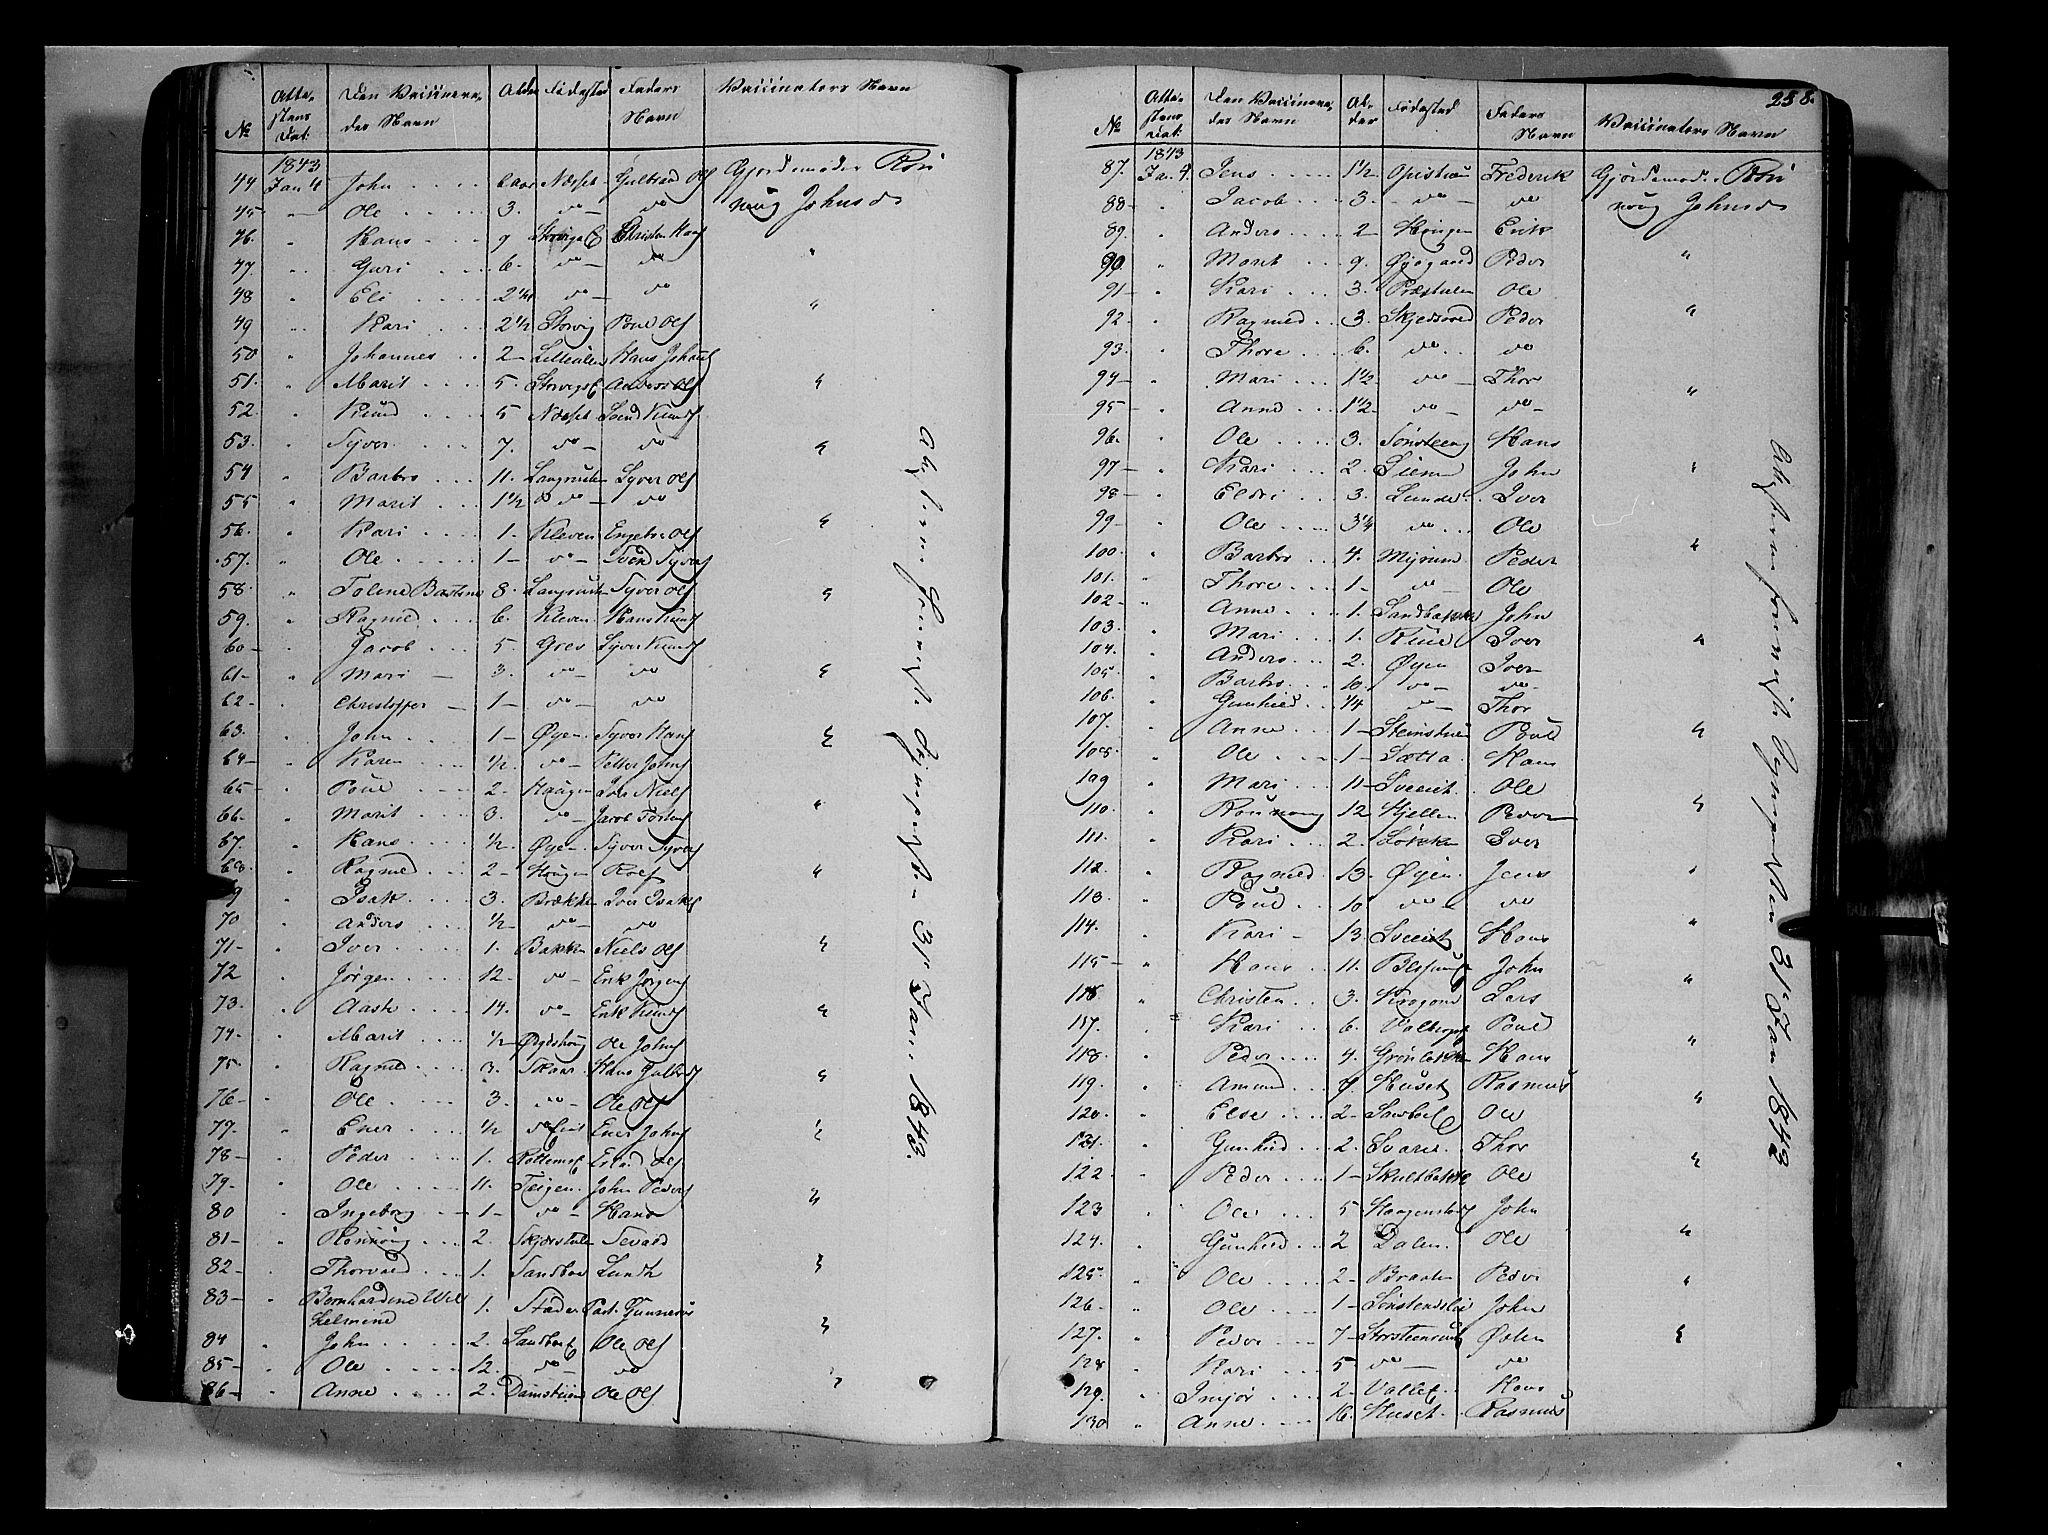 SAH, Vågå prestekontor, Ministerialbok nr. 5 /1, 1842-1856, s. 258